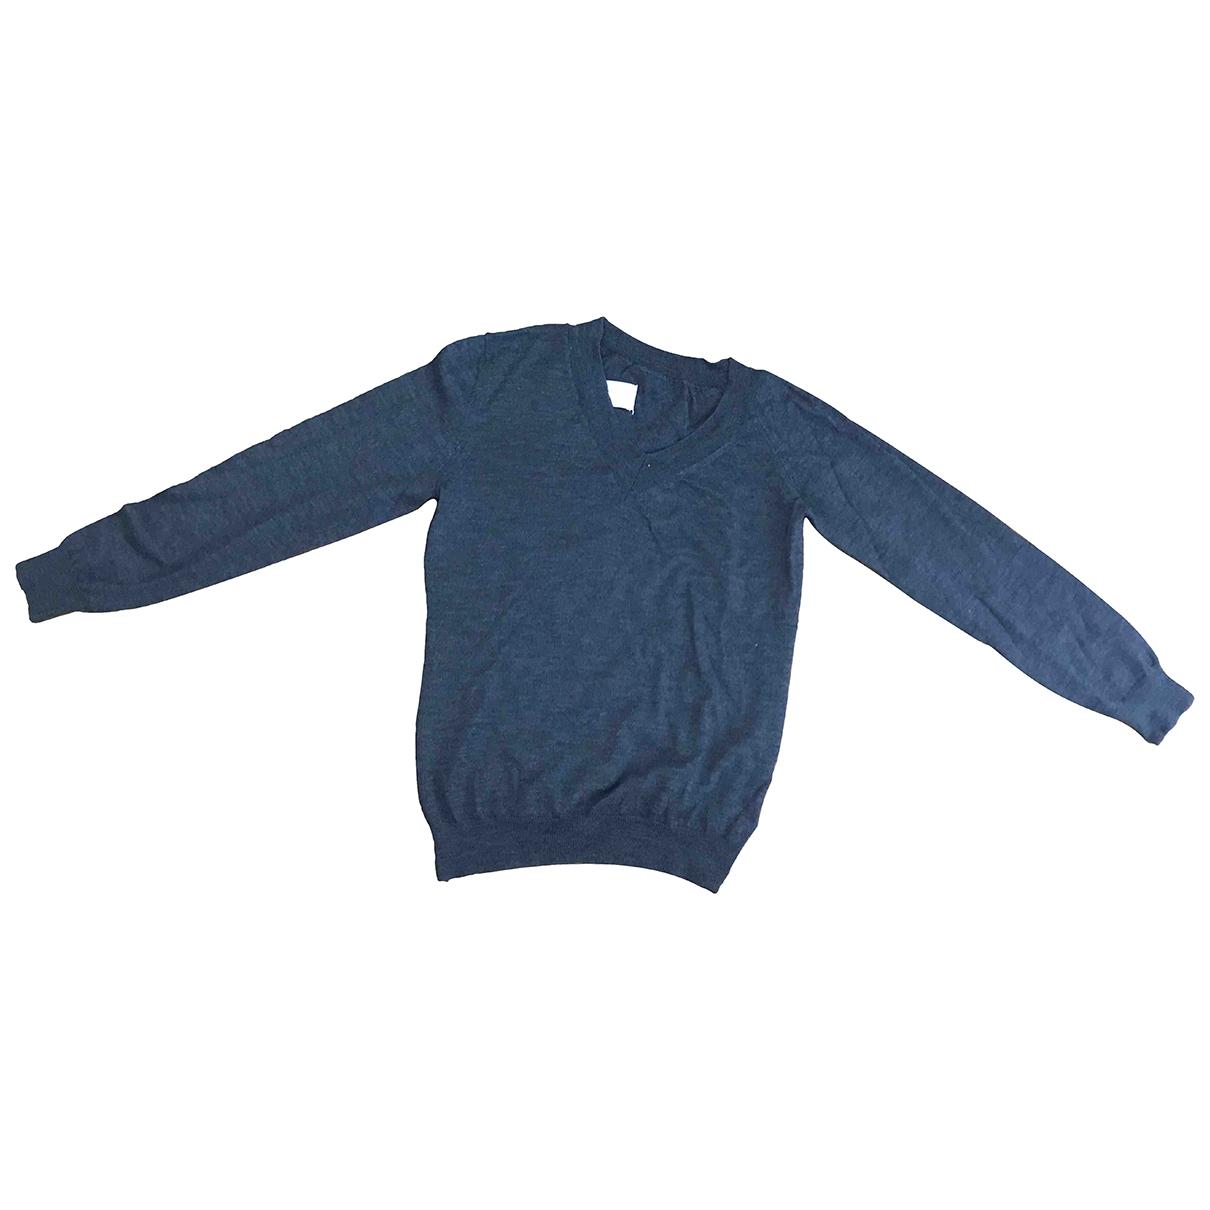 Maison Martin Margiela \N Grey Wool Knitwear & Sweatshirts for Men L International